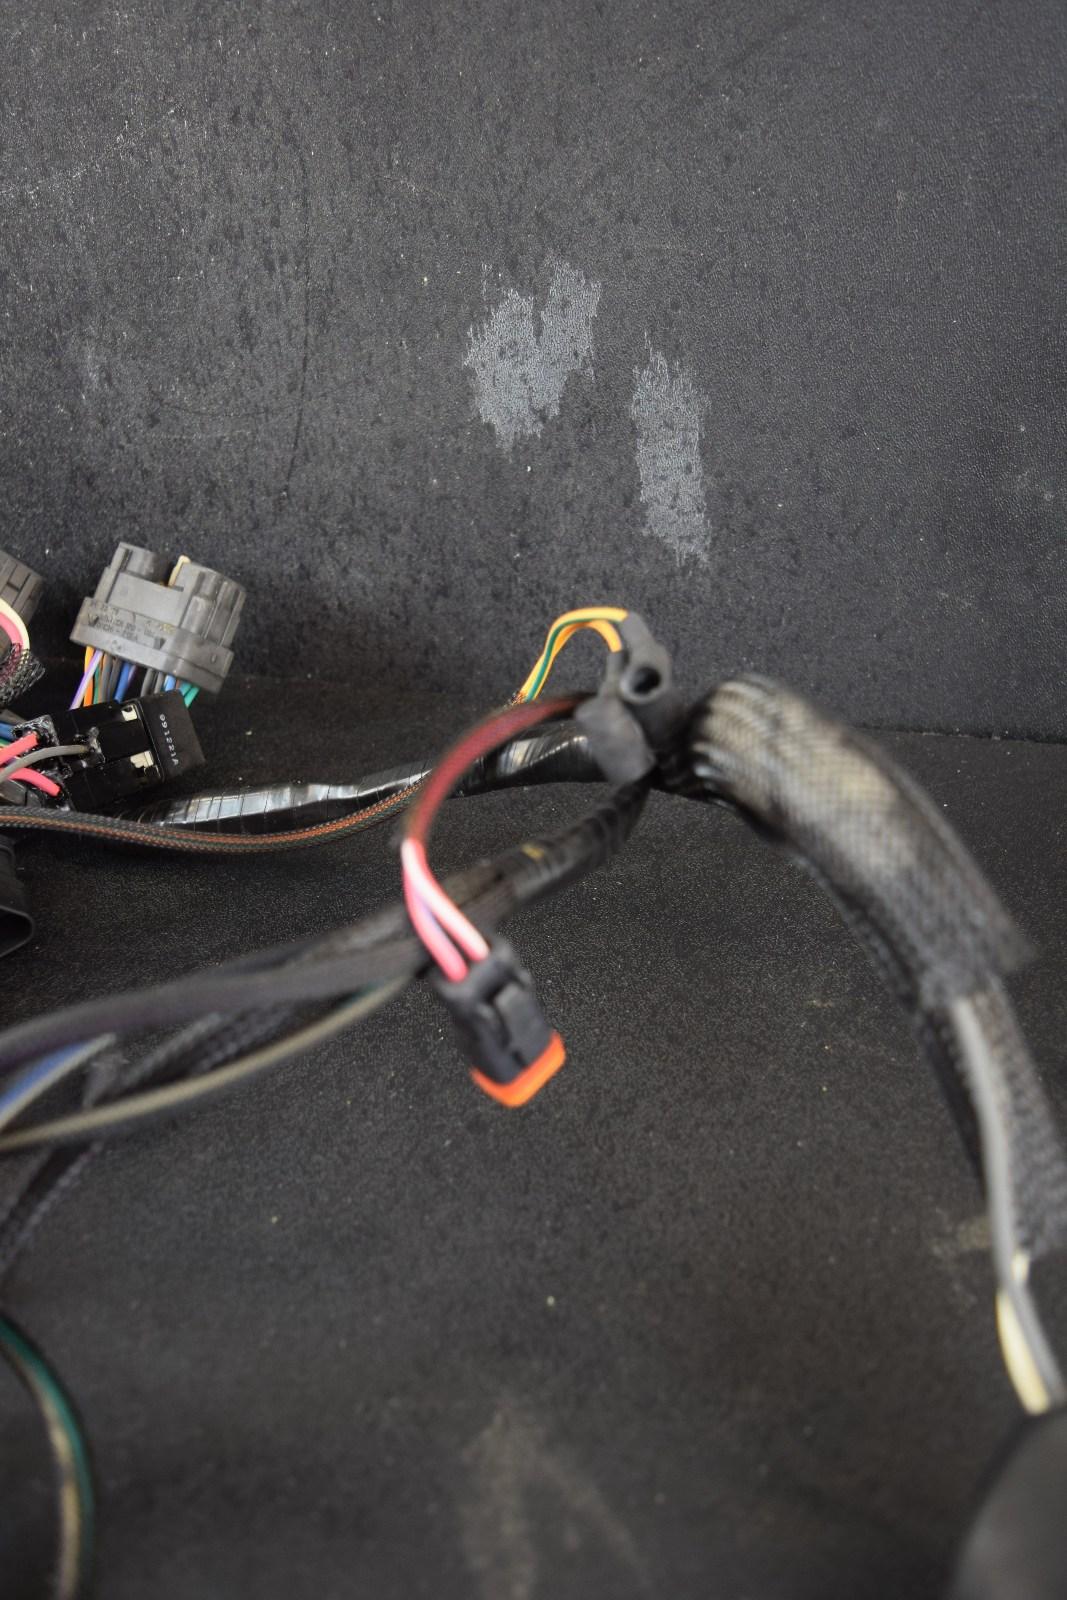 evinrude 115 ficht wiring diagram rb25det s13 oem 2000 2001 motor cable harness 586520